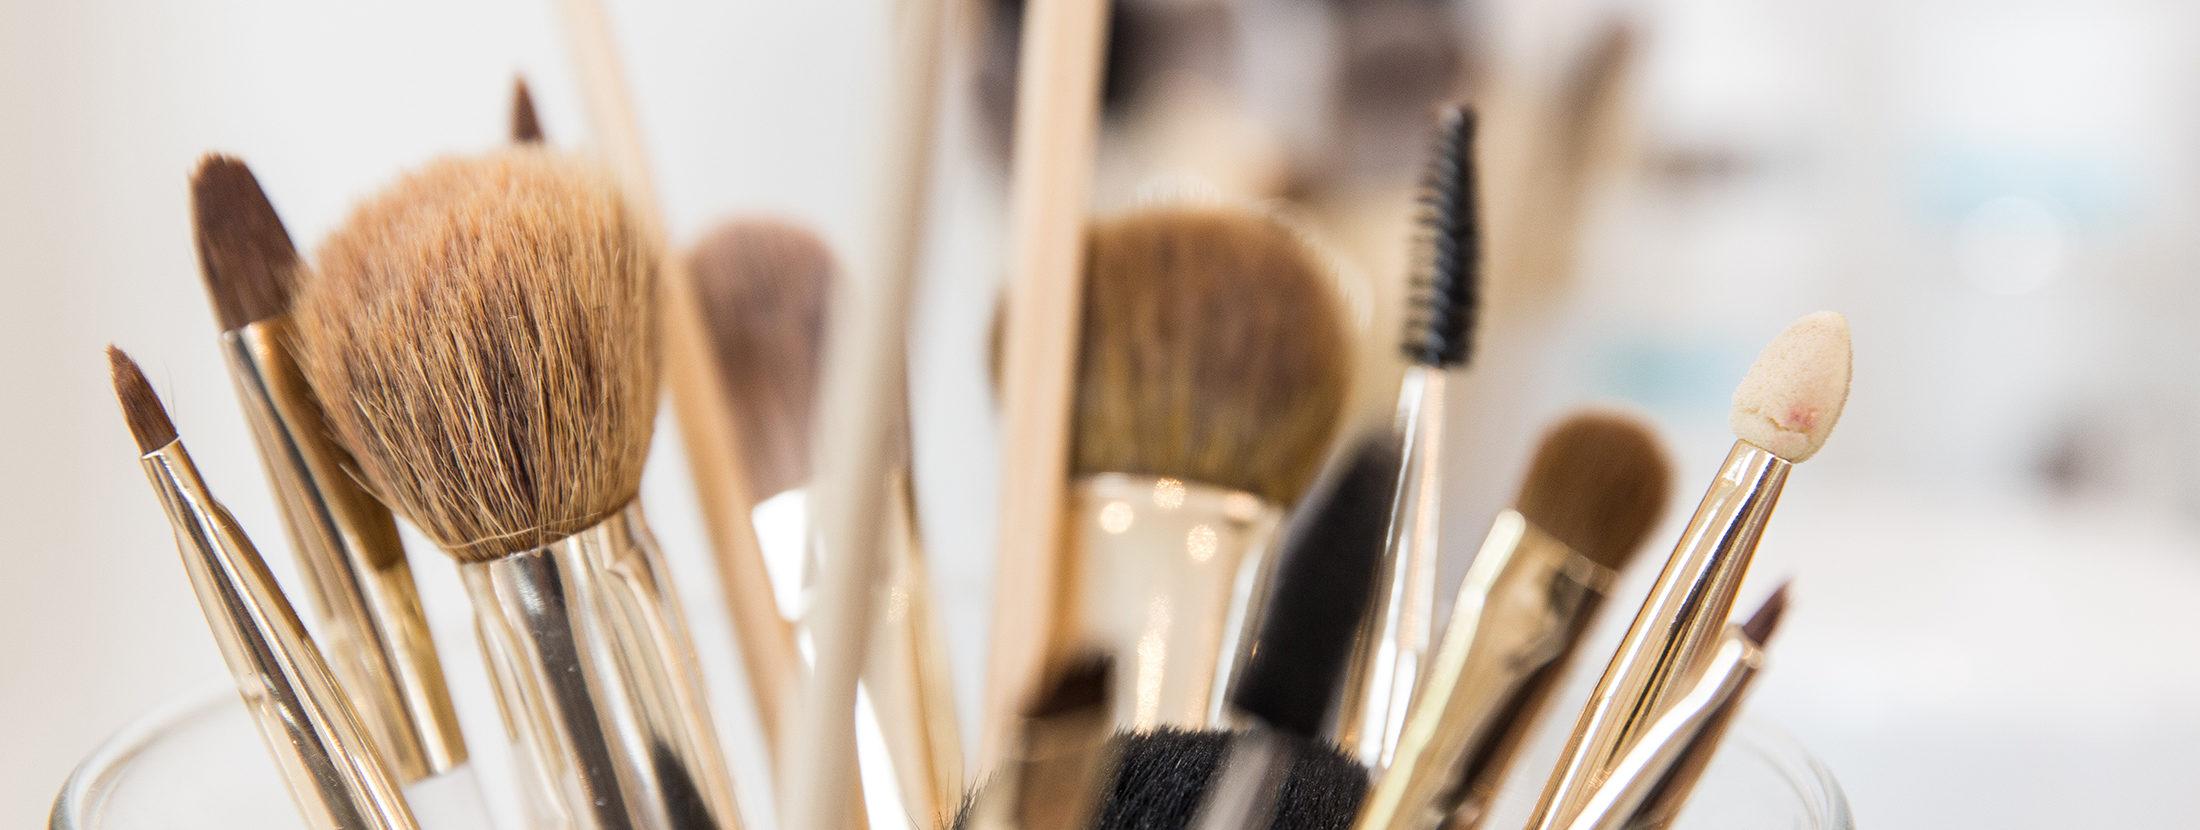 Diverse Pinsel und Makeup-Equipment